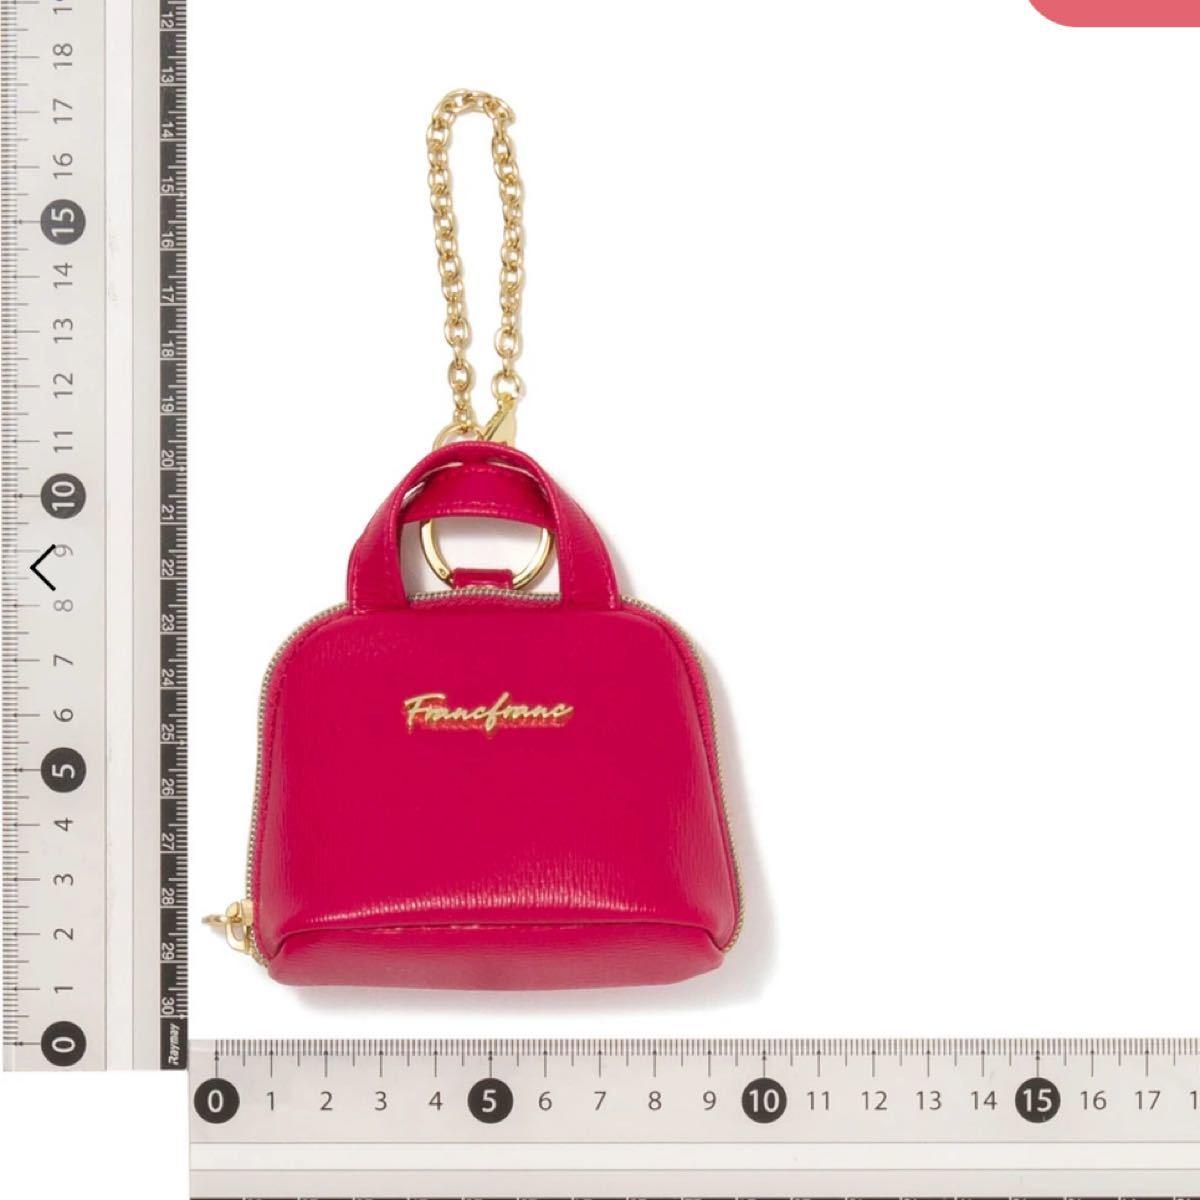 Francfranc フランフラン ☆  エコバッグ バッグ 新品